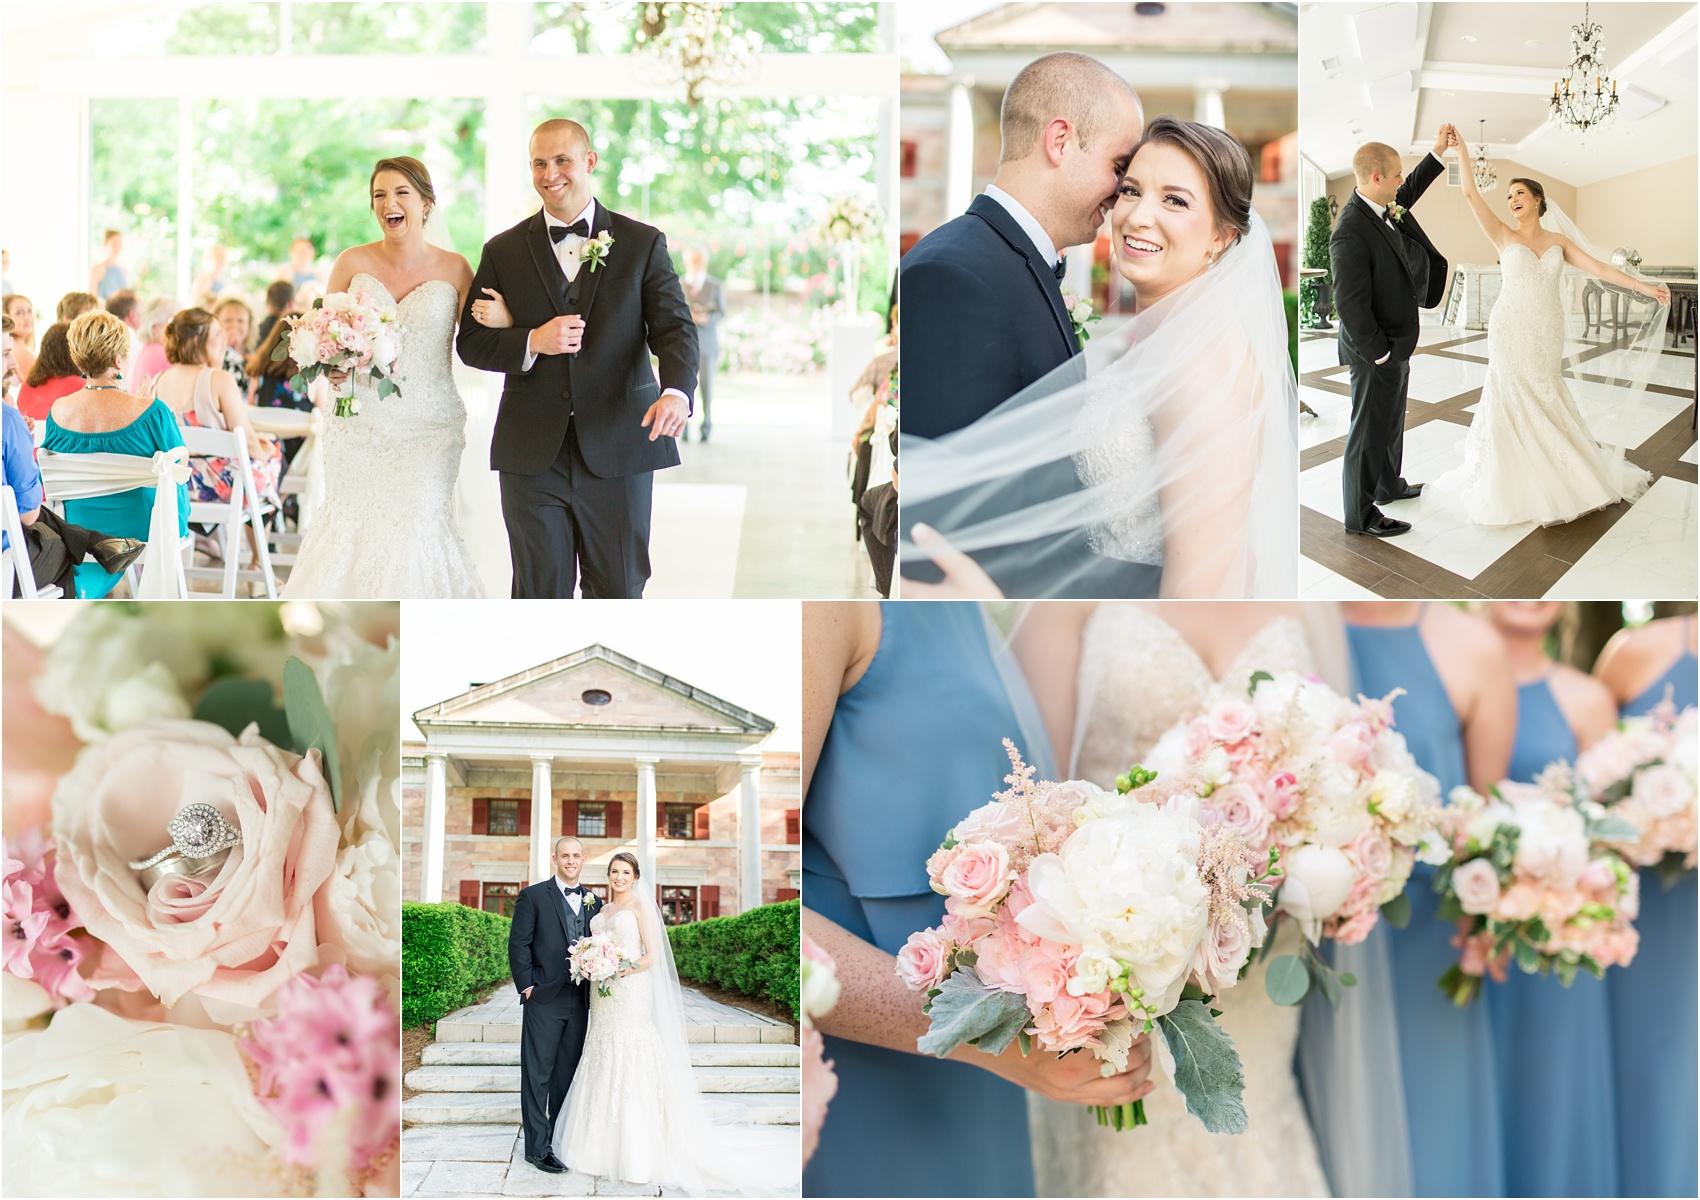 Savannah Eve Photography- Nutt Wedding- Sneak Peek-7.jpg